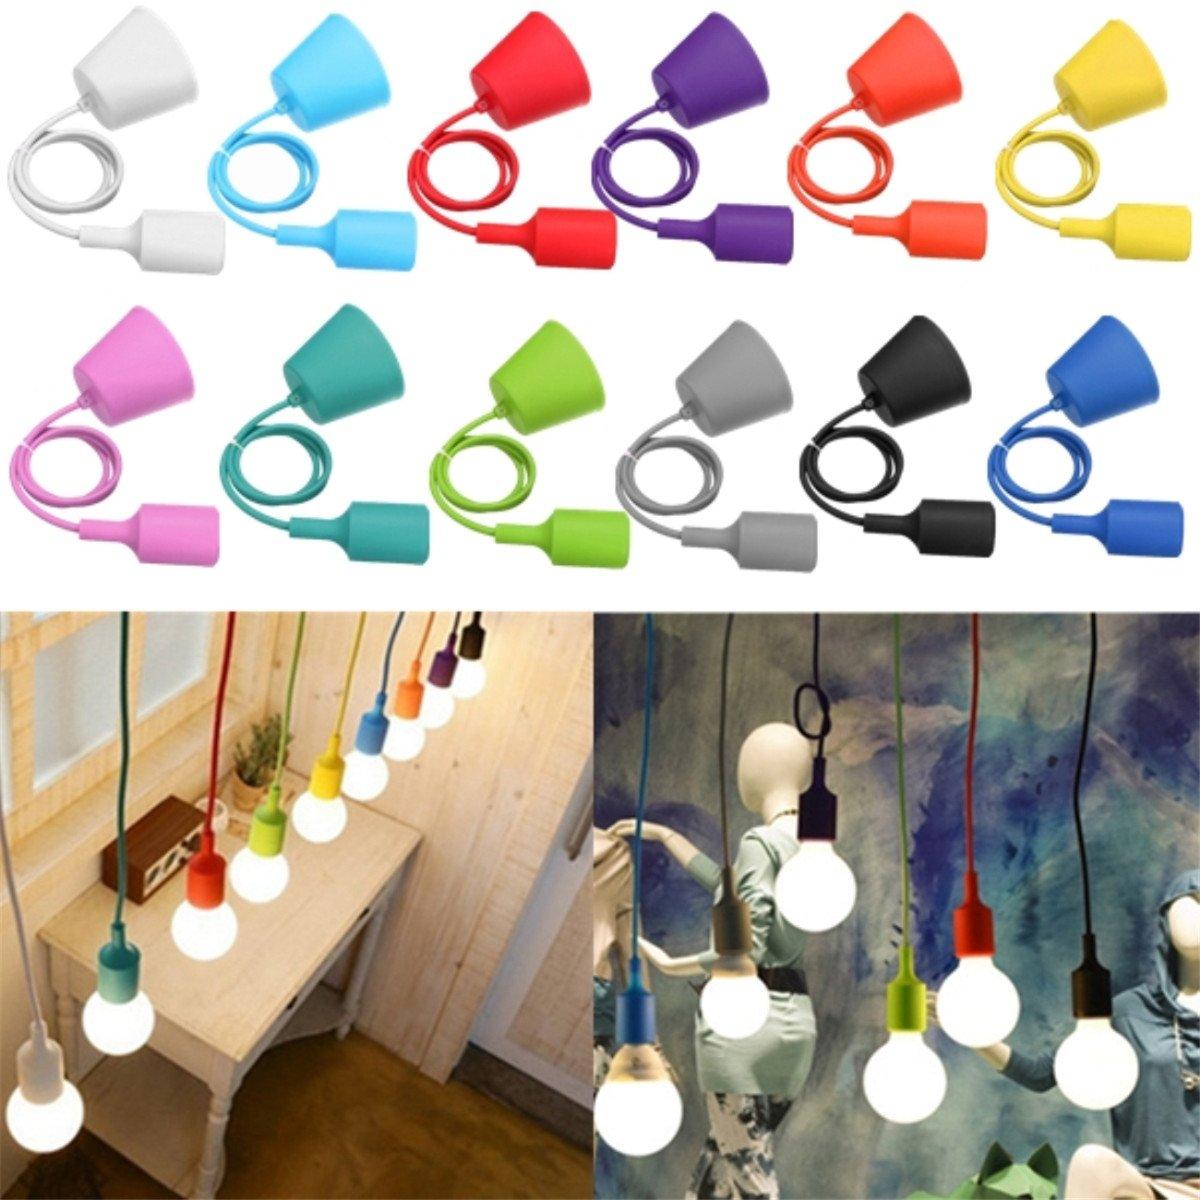 KINGSO E27 Silicone Lampenaufhängung Rubber Fassung Glühbirne Lampenkabel Pendelleuchte Lampenfassung DIY Lampenhalter Lampensockel